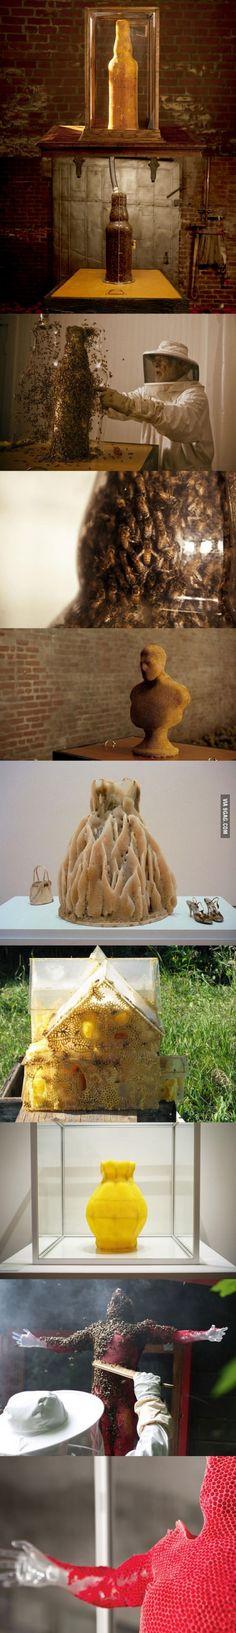 Amazing 3D Sculptures Built by Bees.